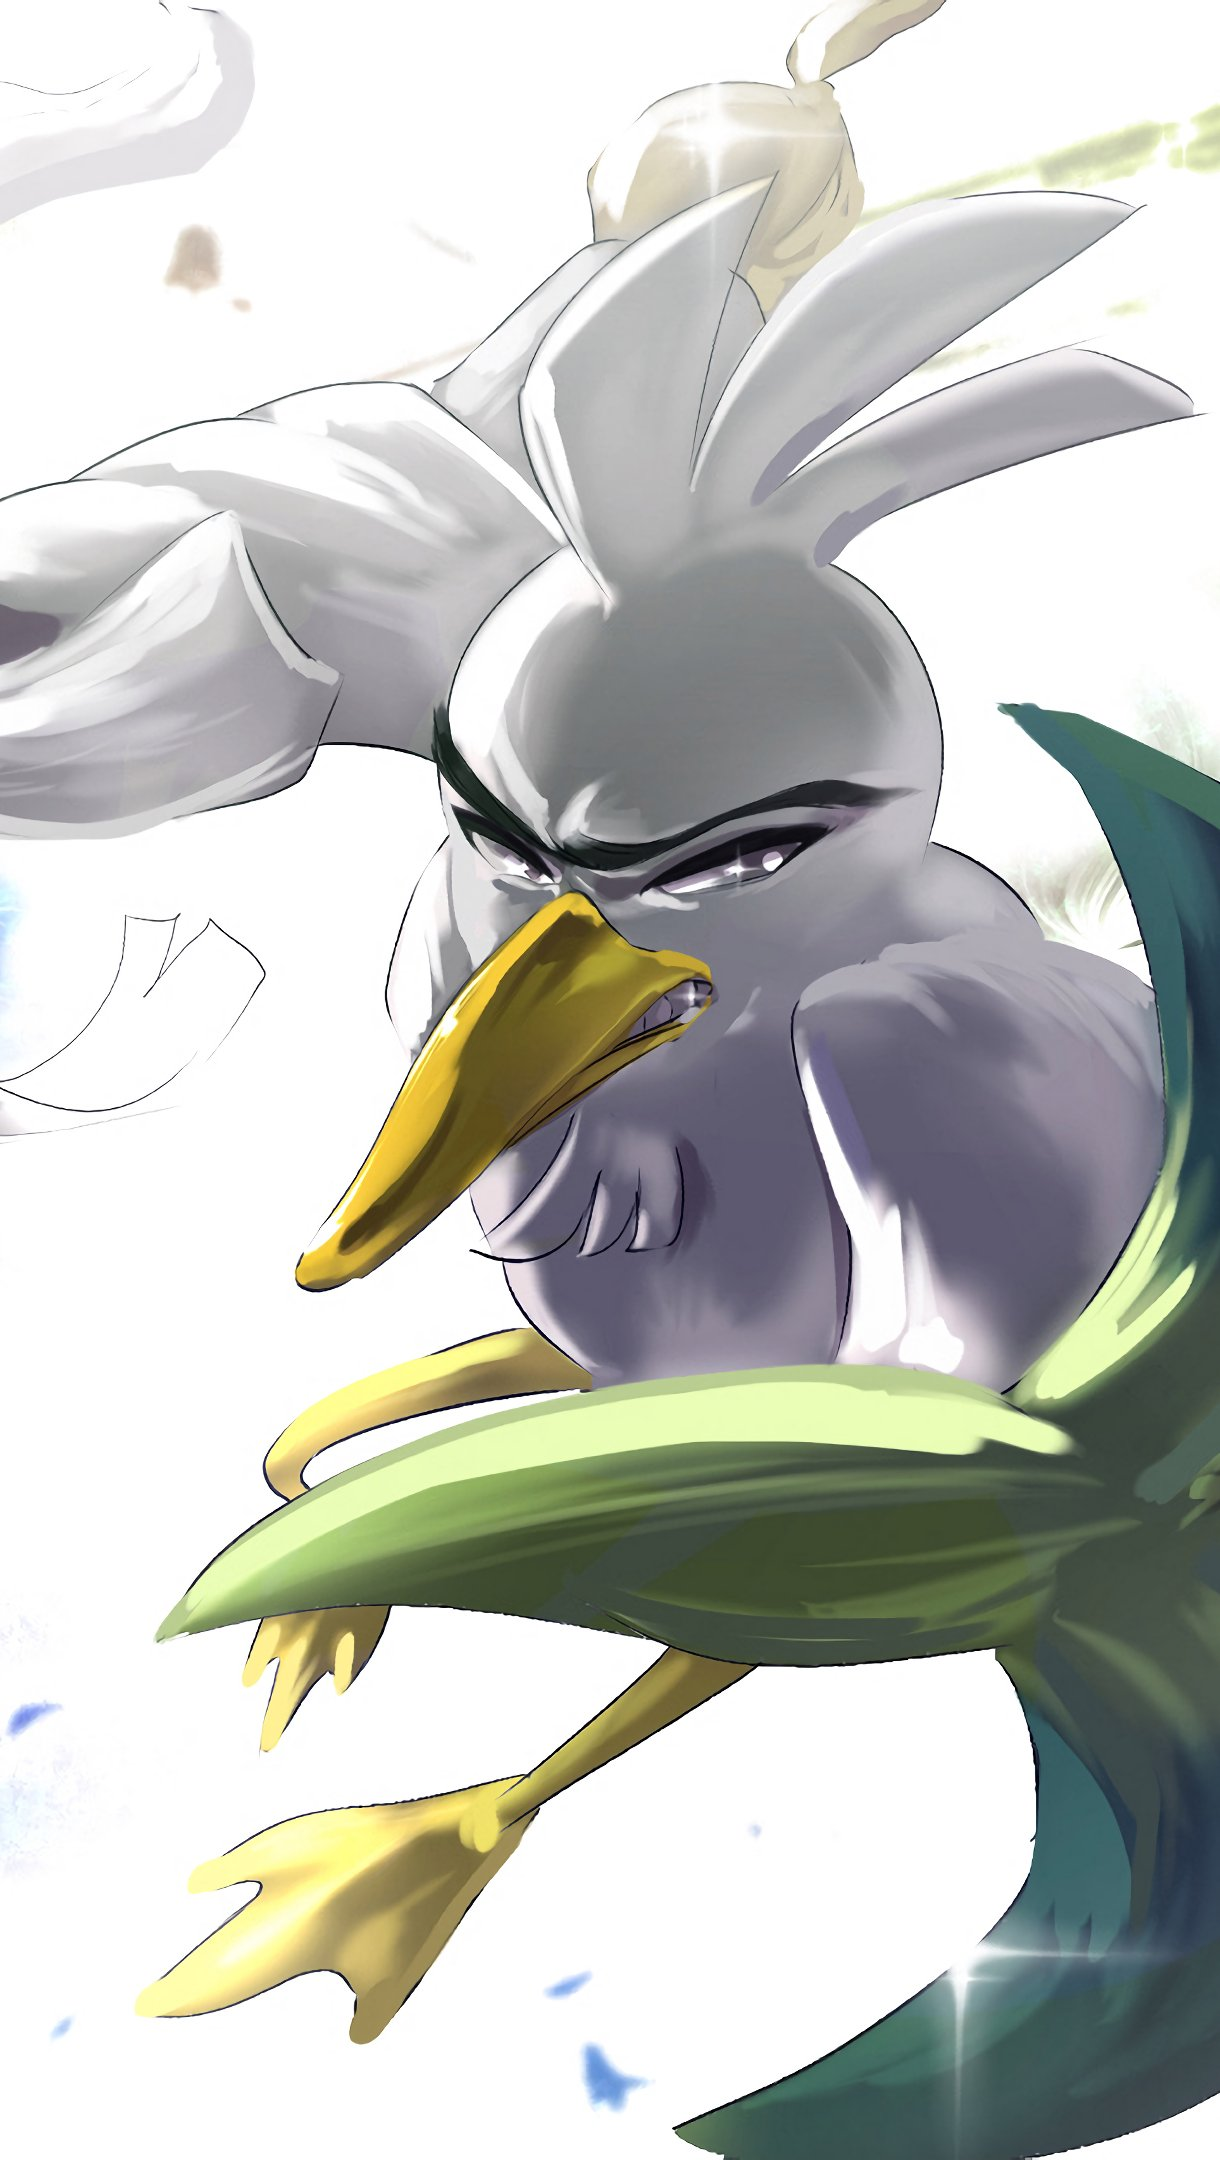 Fondos de pantalla Sirfetch'd Pokemon Espada y Pokemon Escudo Vertical